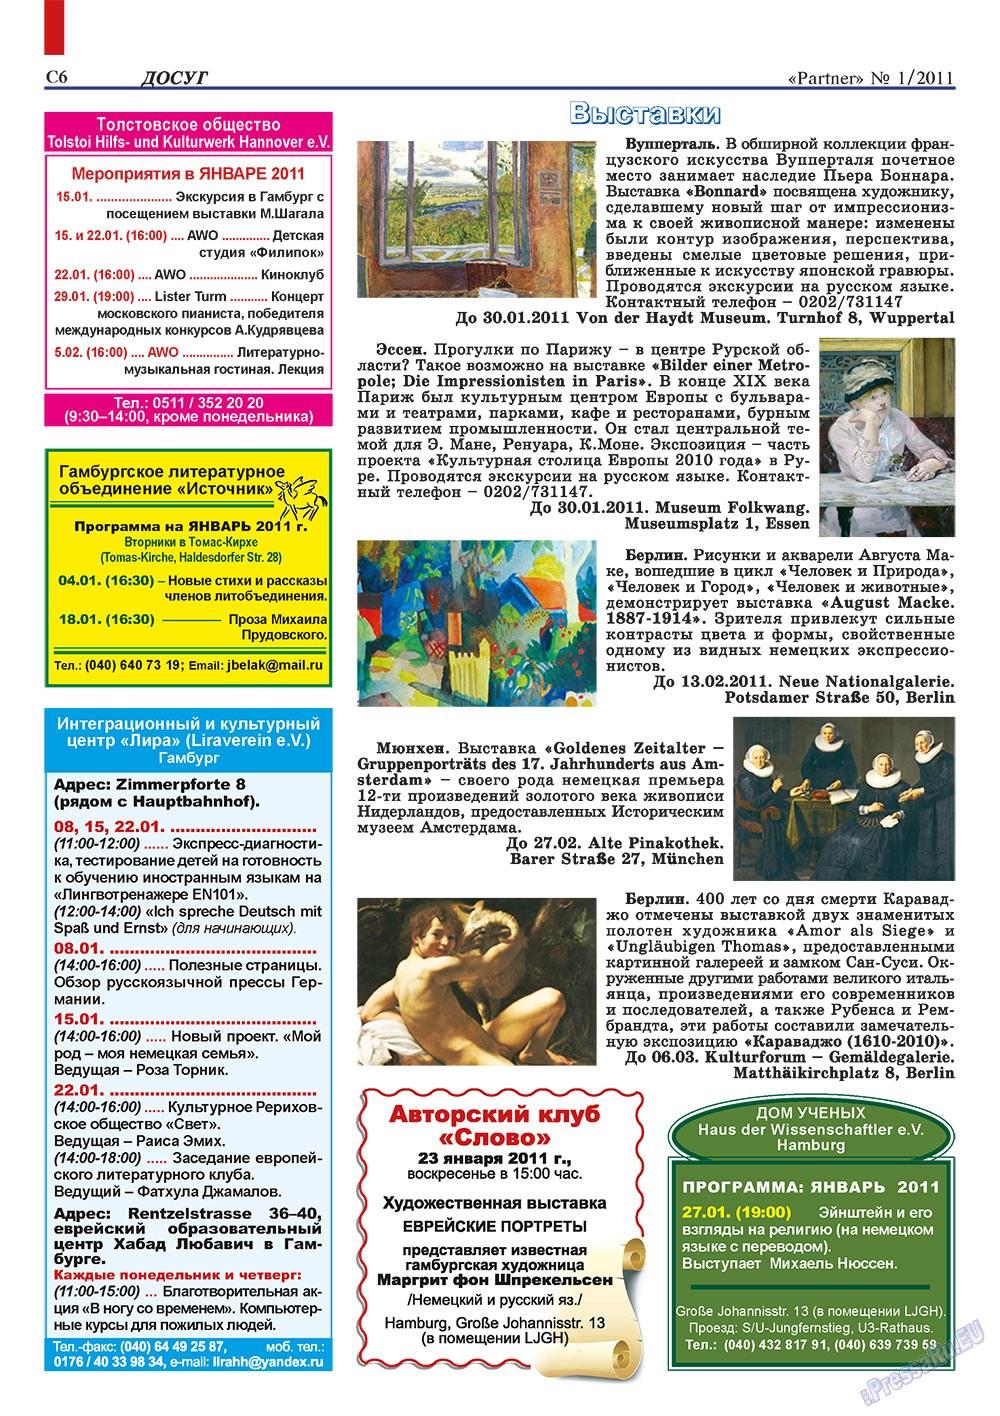 Партнер-север (журнал). 2011 год, номер 1, стр. 64